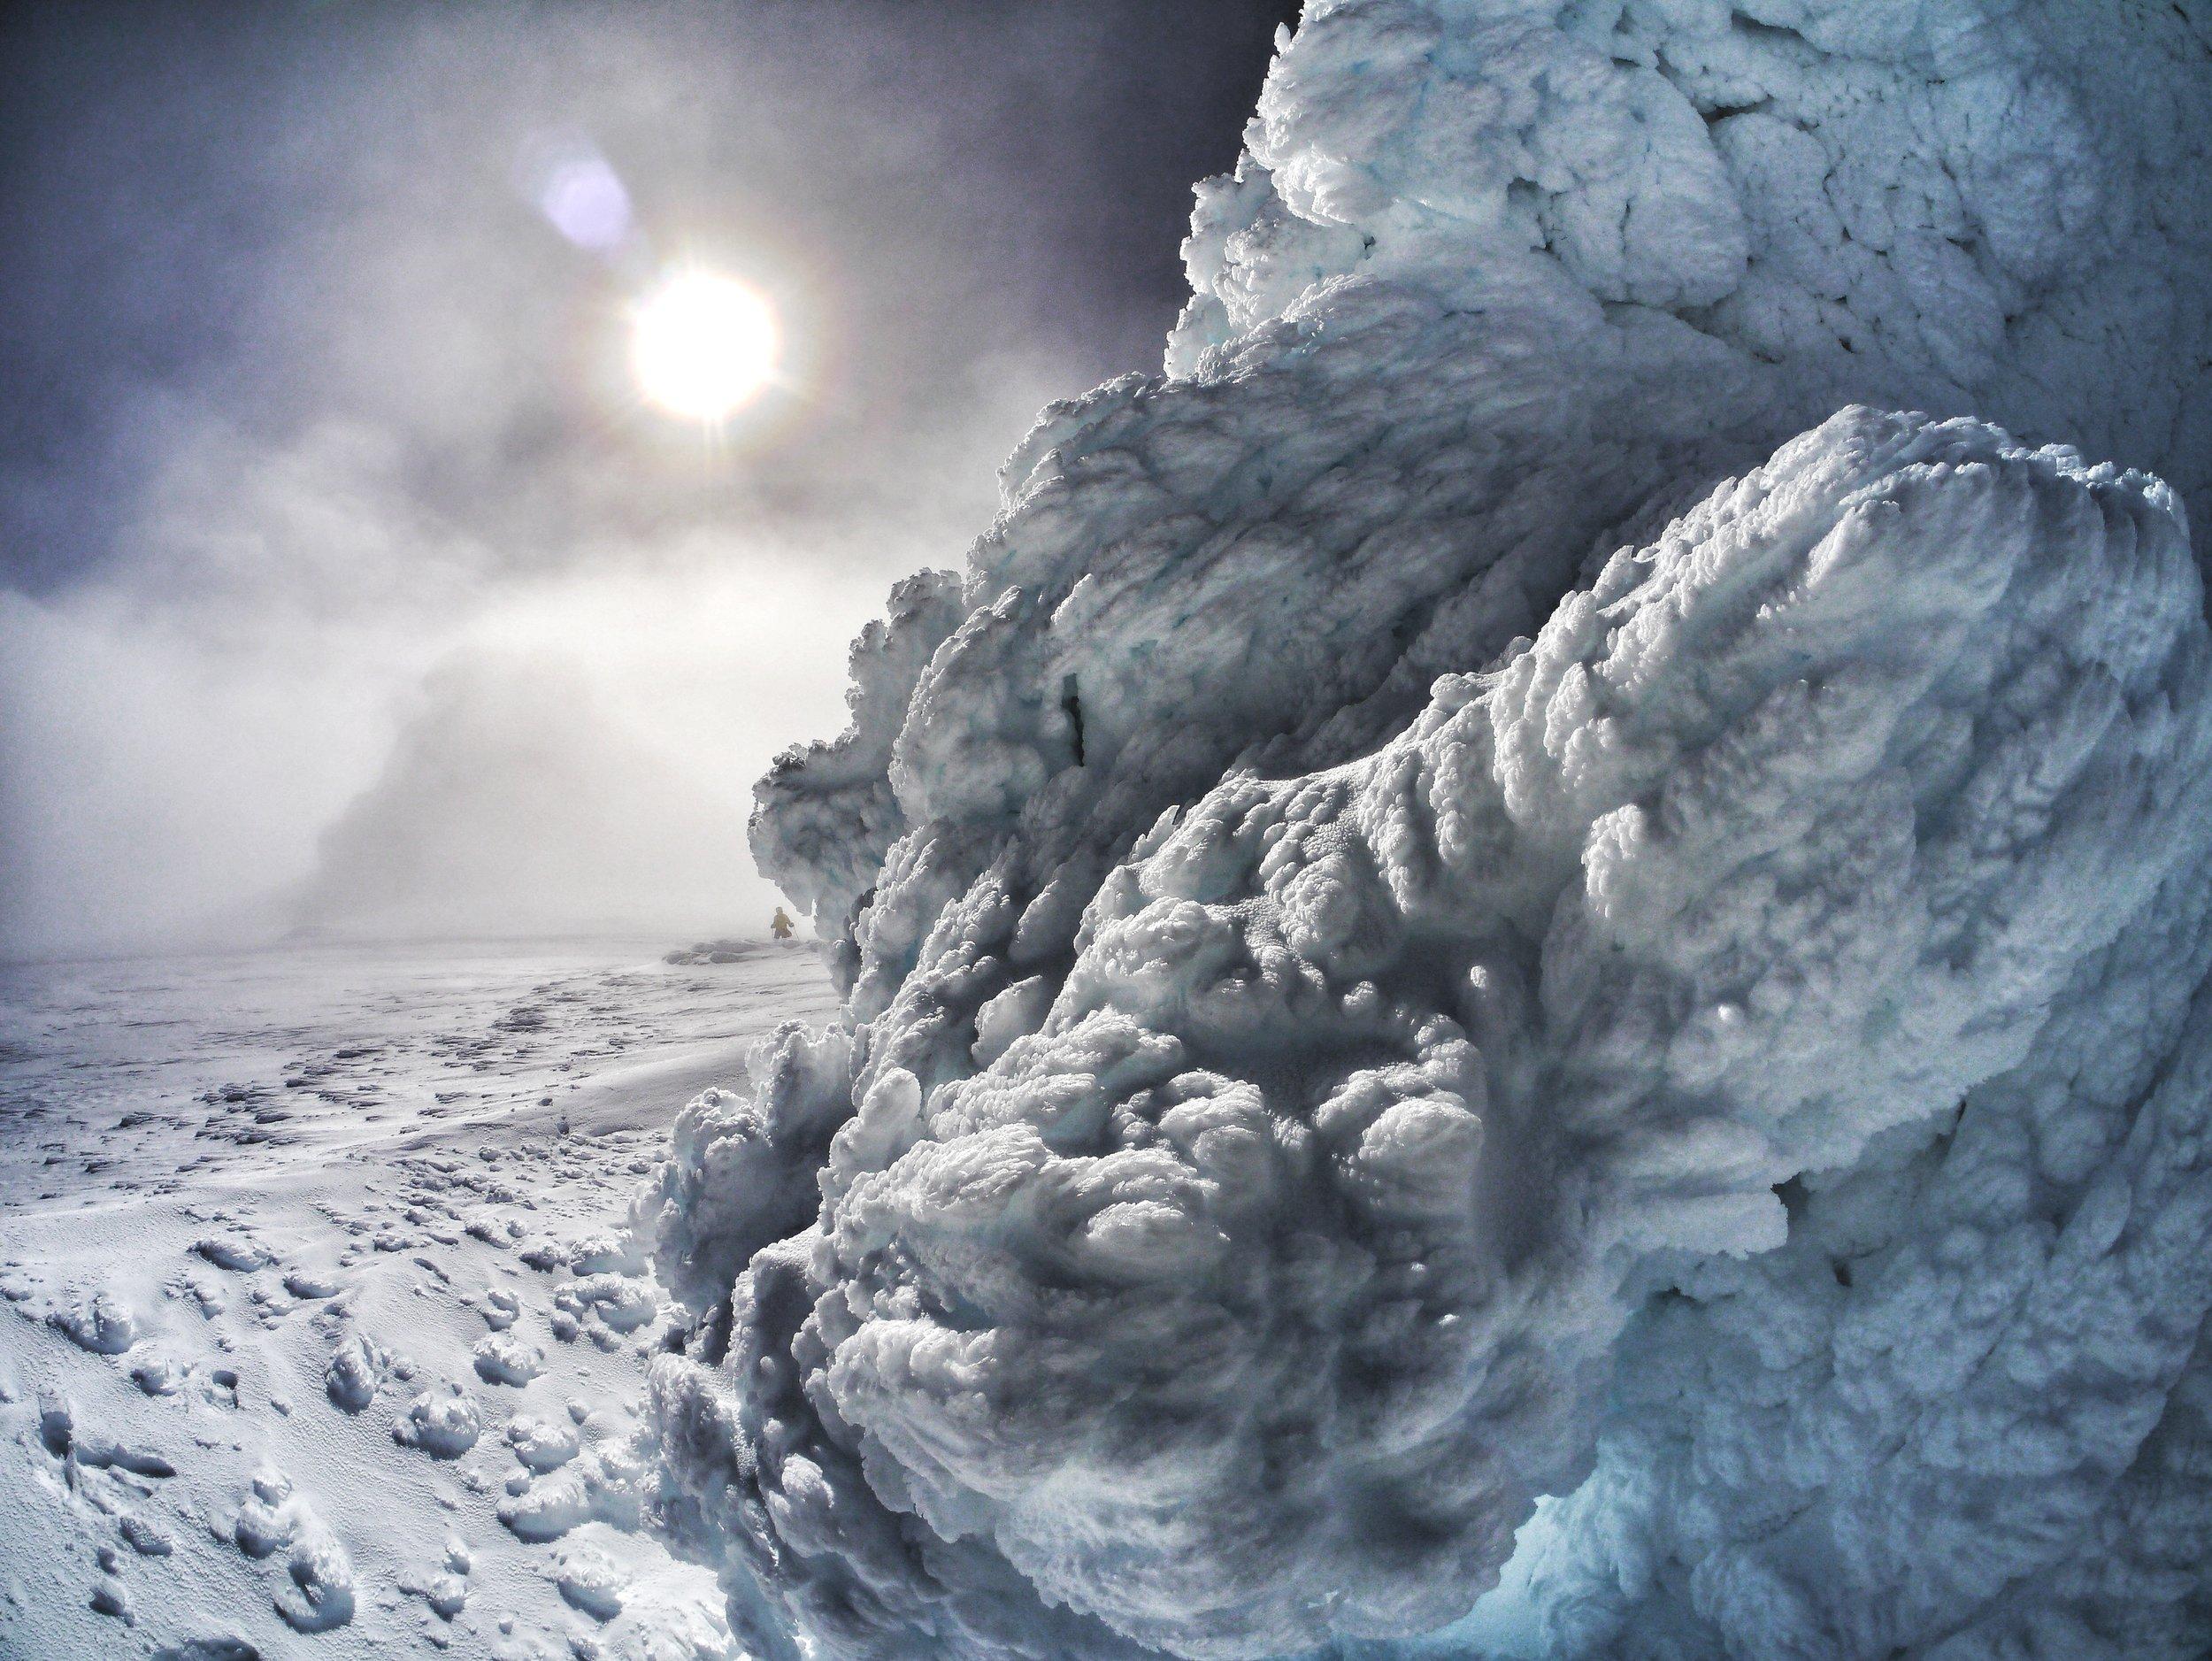 Summit ice on Snæfellsjökull